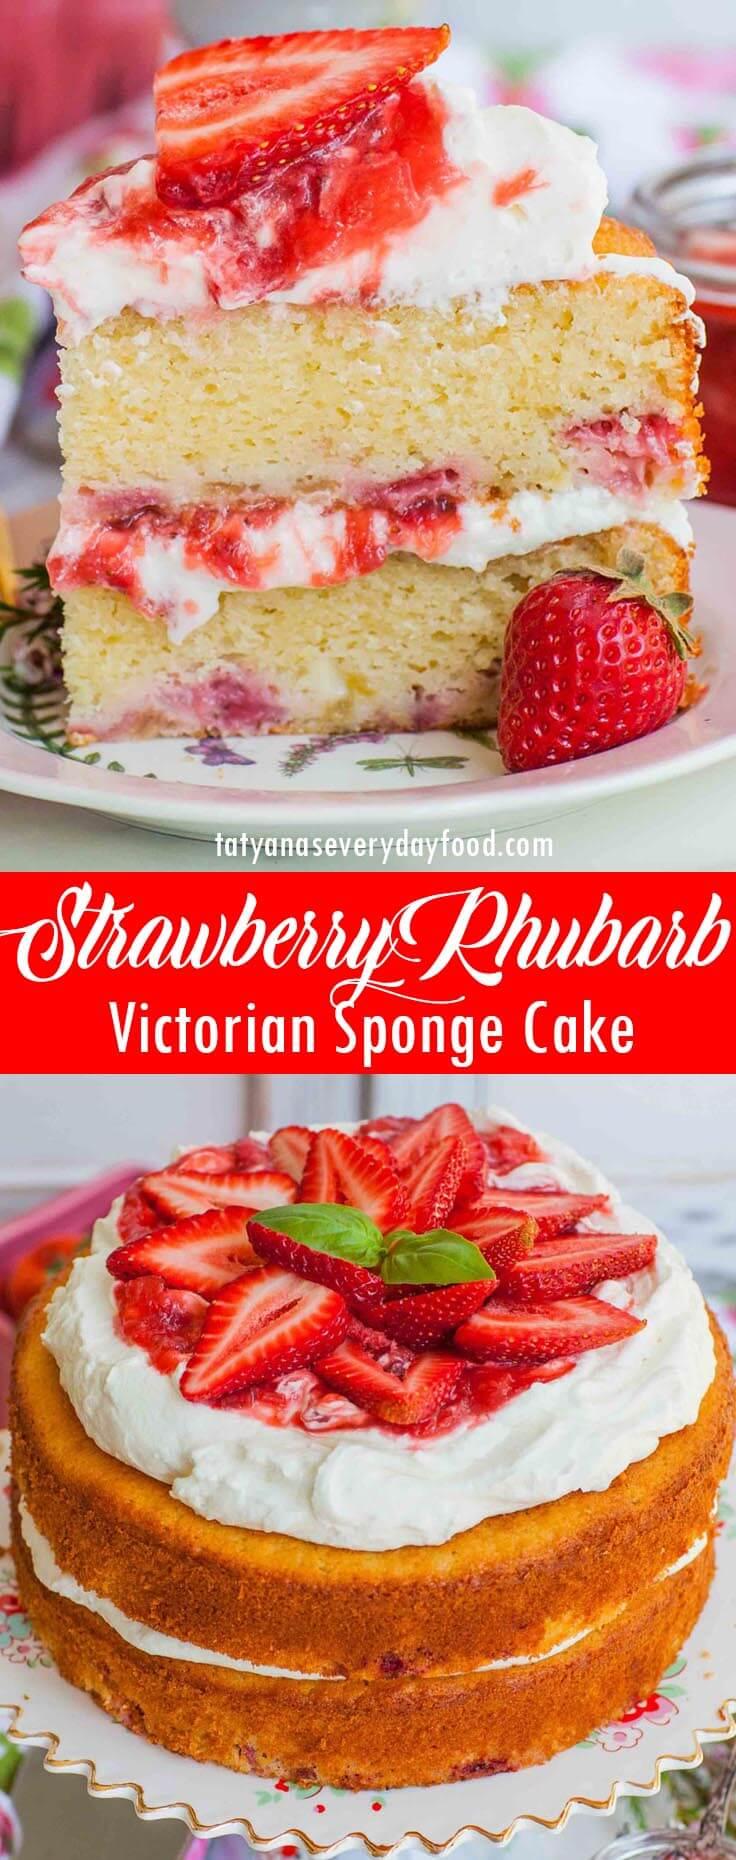 Strawberry Rhubarb Cake video recipe